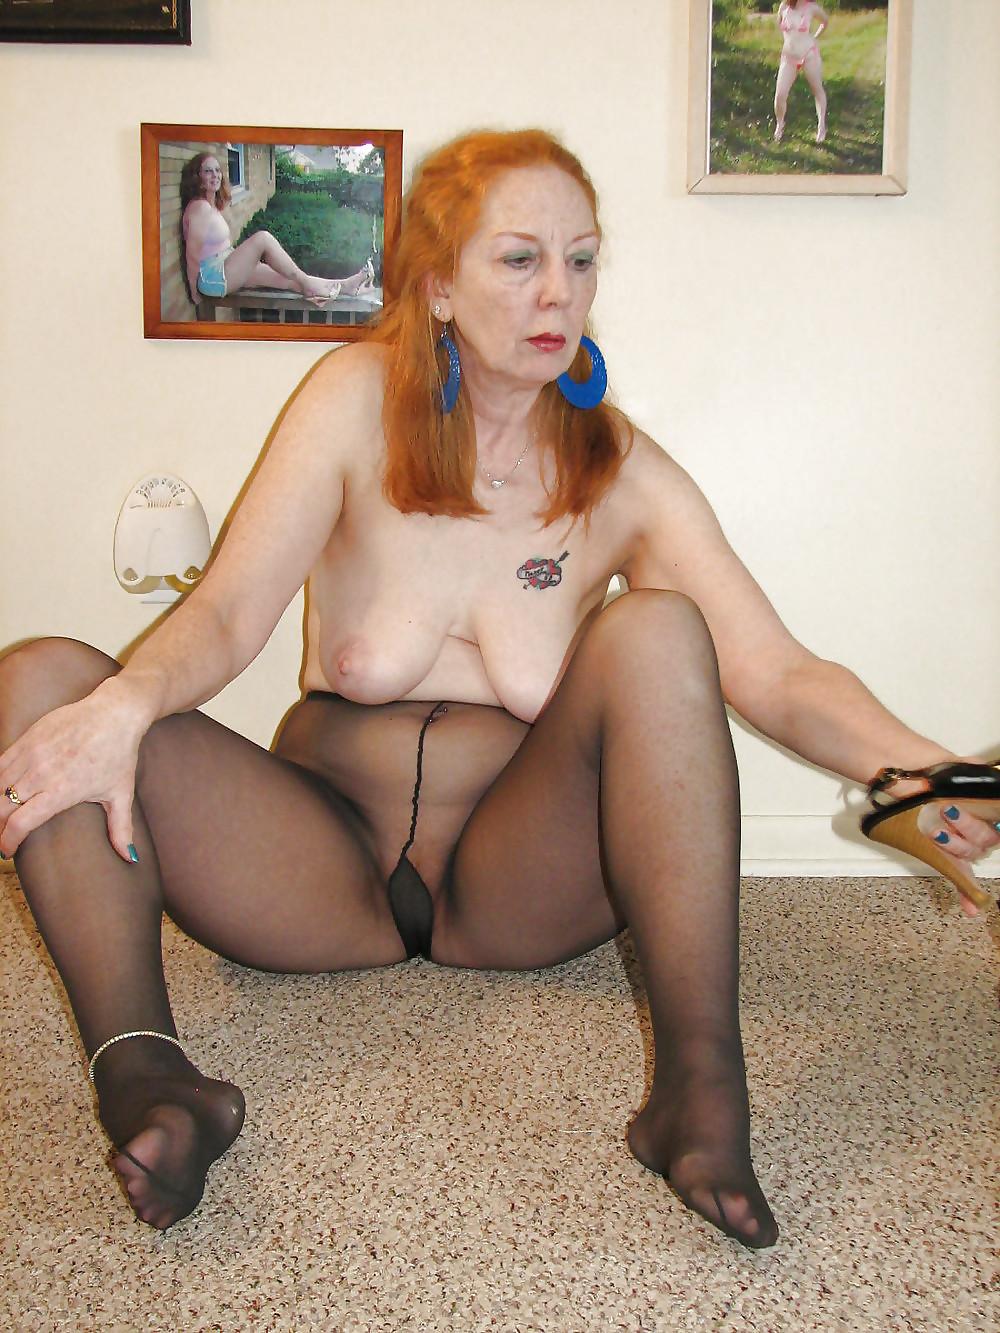 Angelica Chain Nude free nude pantyhose mature pics » micact.eu